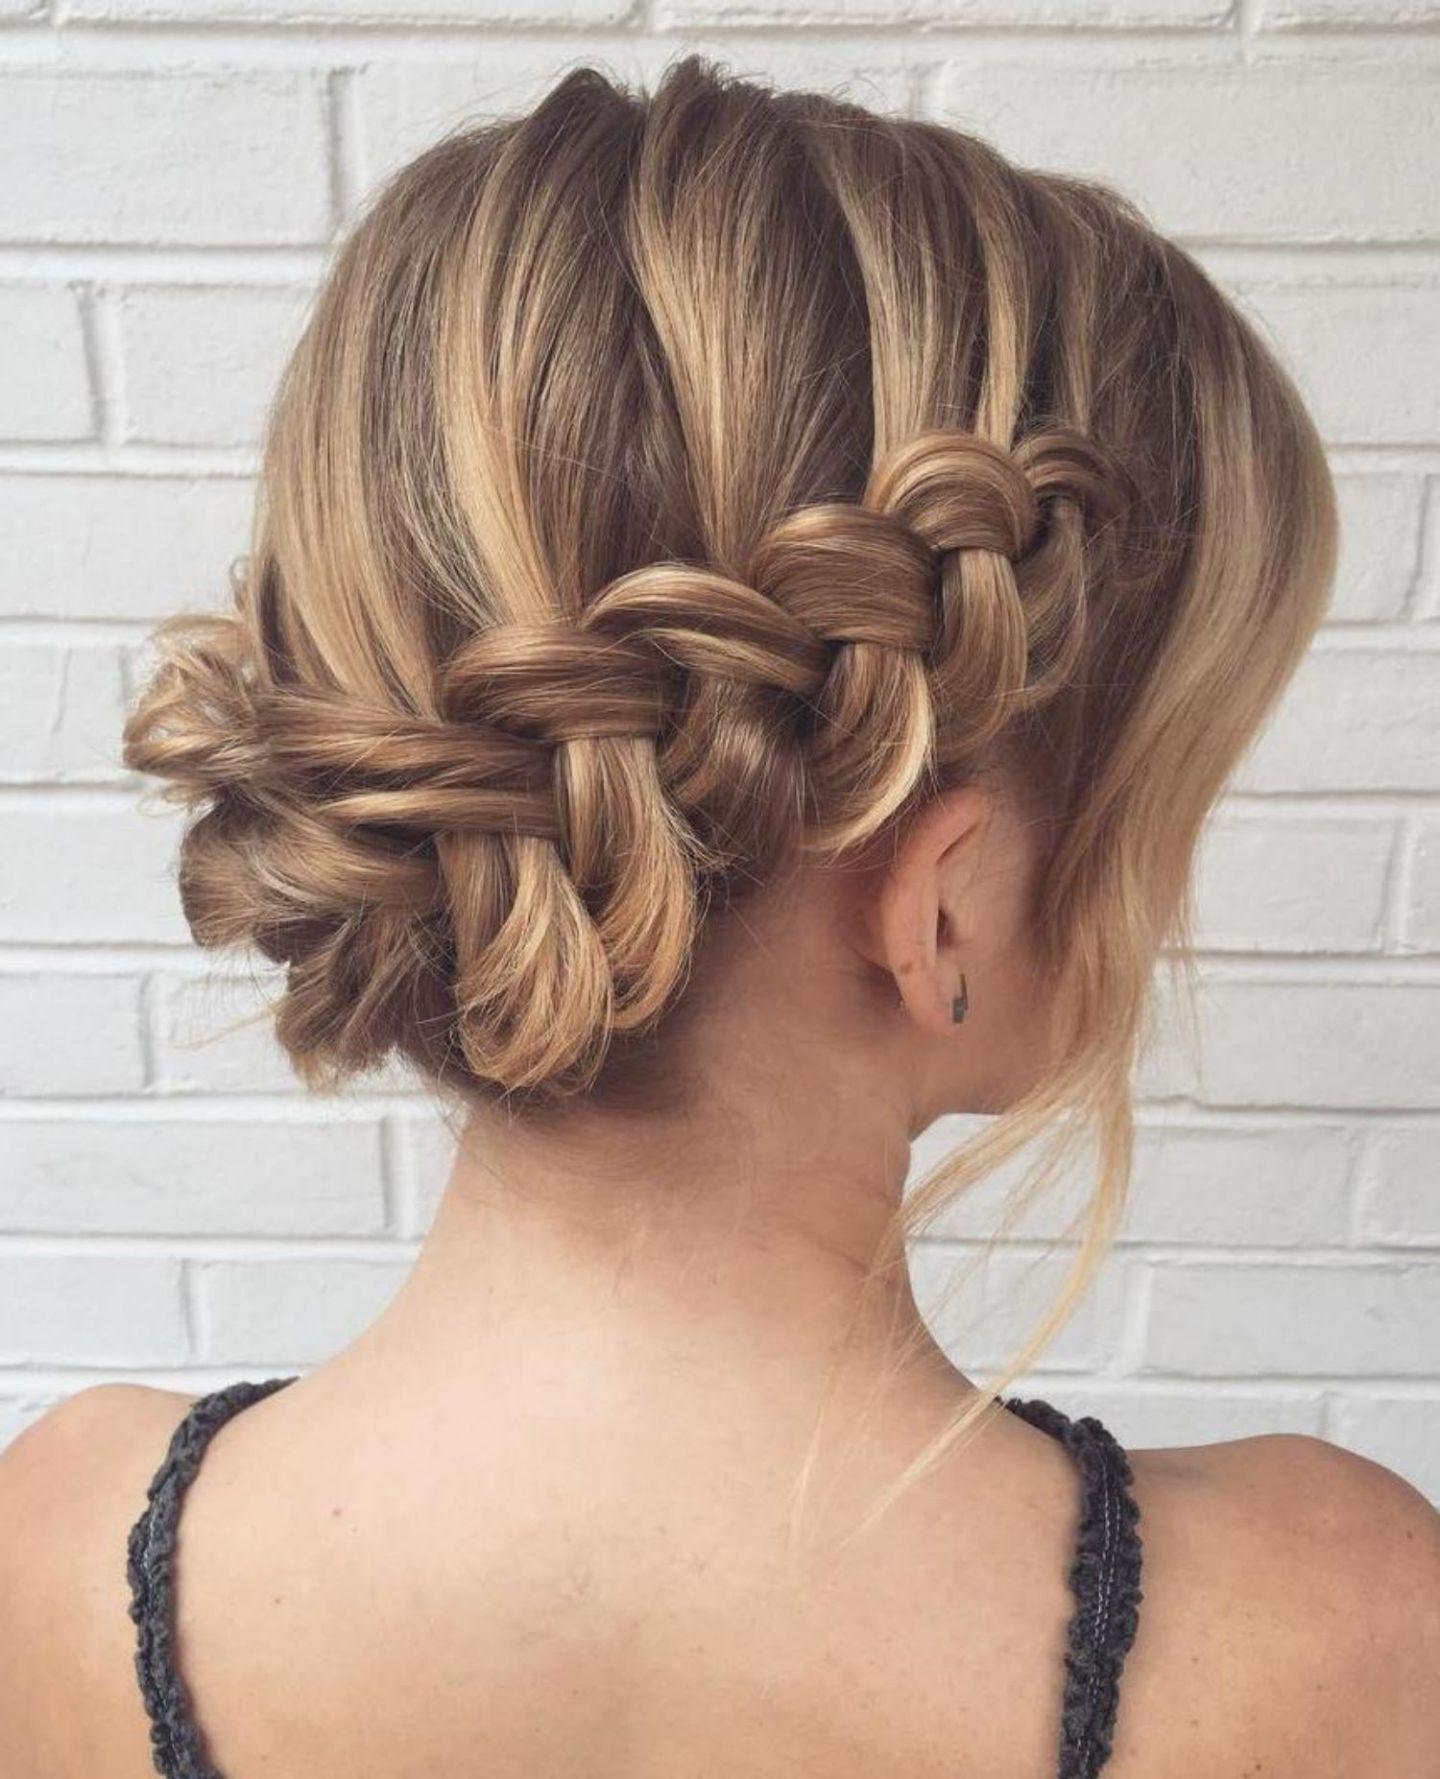 Updo With Dutch Waterfall Braid Prom Hairstyles For Long Hair Box Braids Wedding